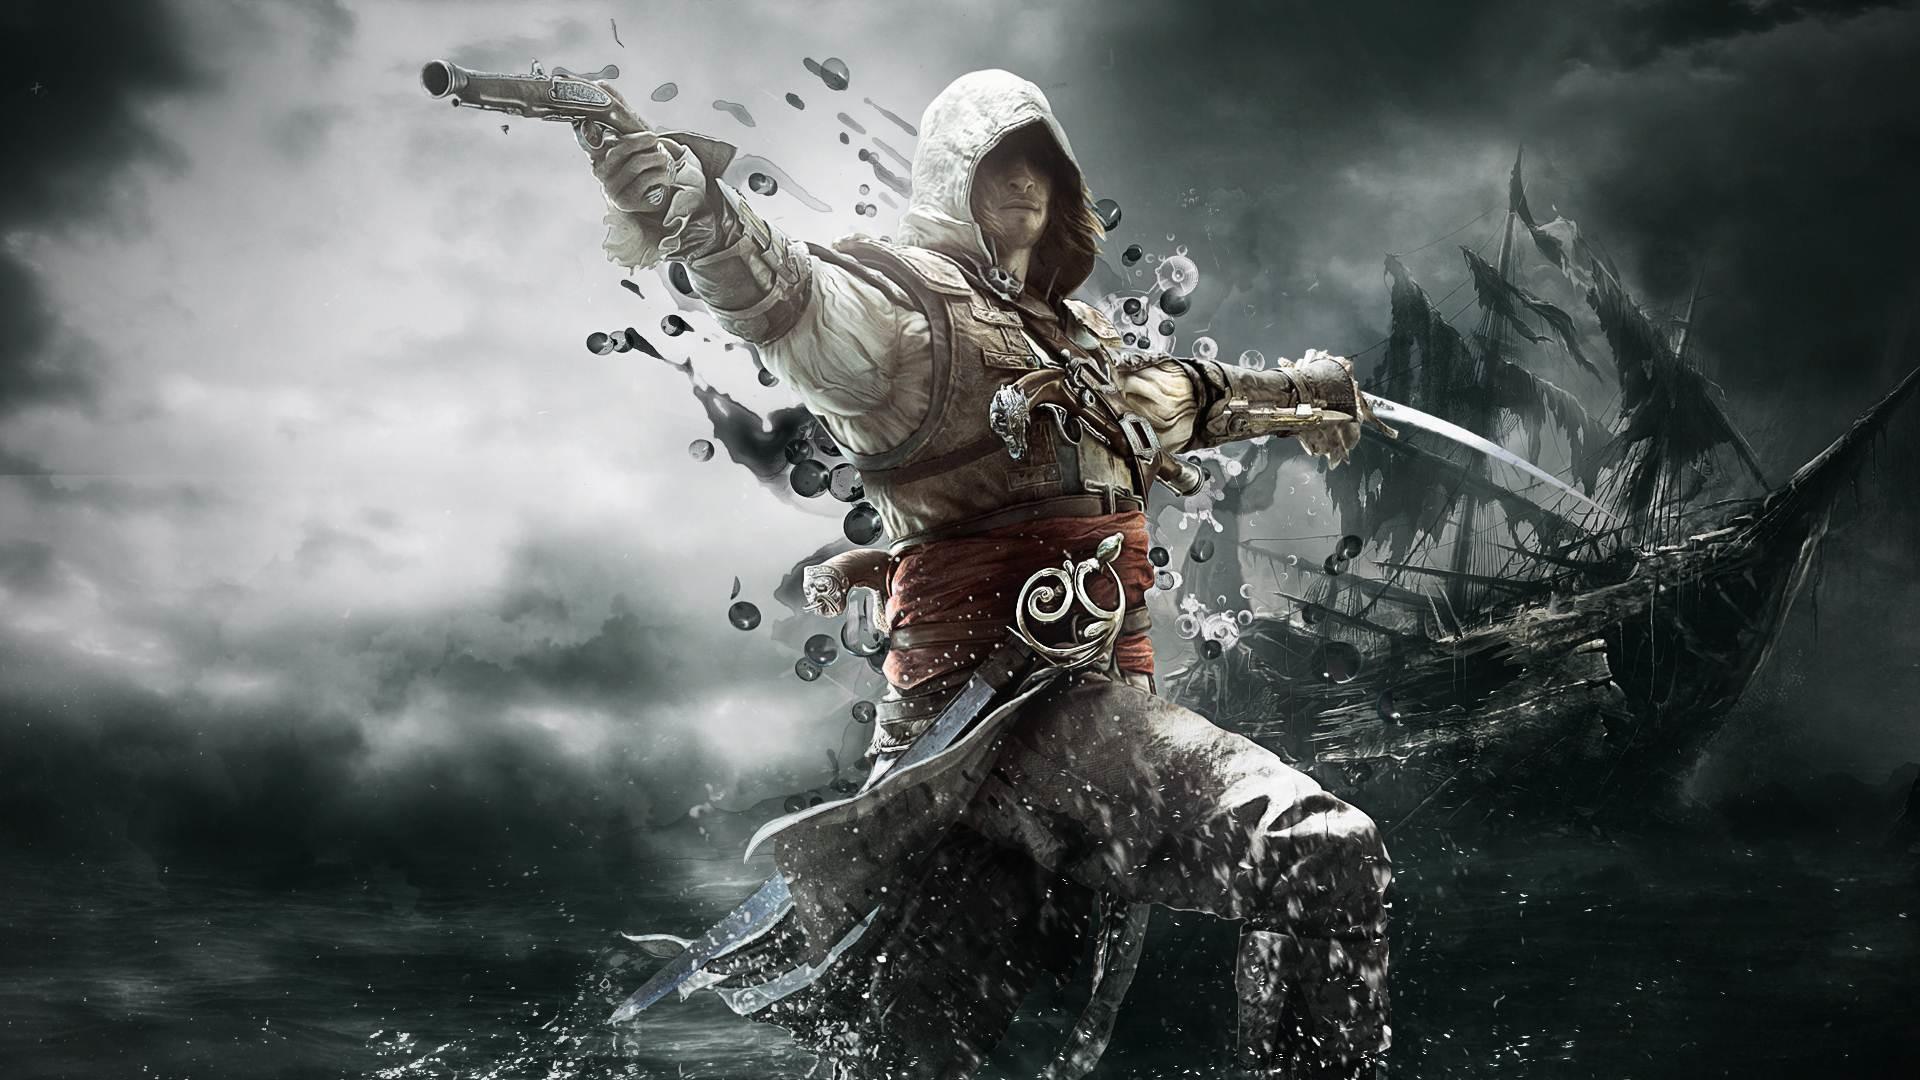 Assassins Creed Rogue Wallpaper 1080p (76+ images)Assassins Creed Brotherhood Wallpaper 1920x1080